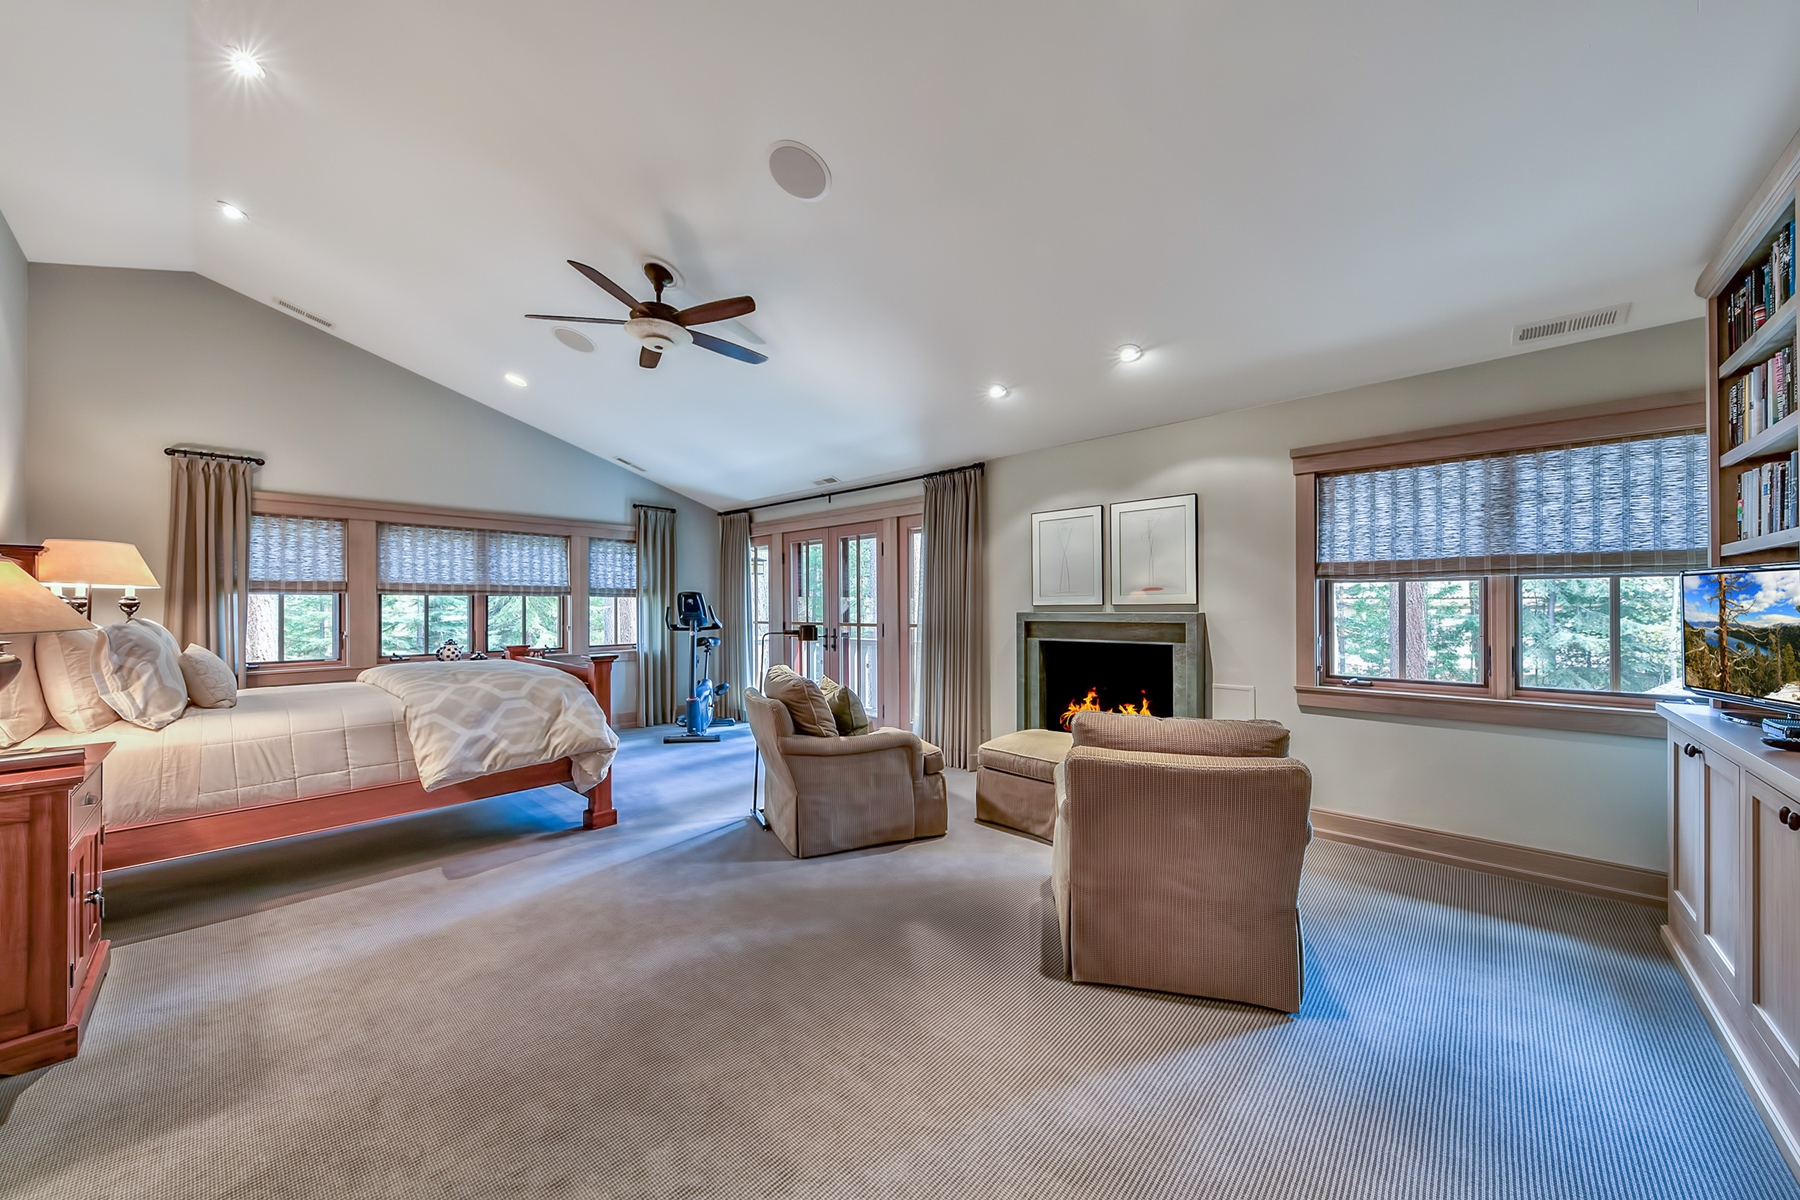 Additional photo for property listing at 1570 Vivian Lane, Incline Village, Nevada 1570 Vivian Lane Incline Village, Nevada 89451 United States